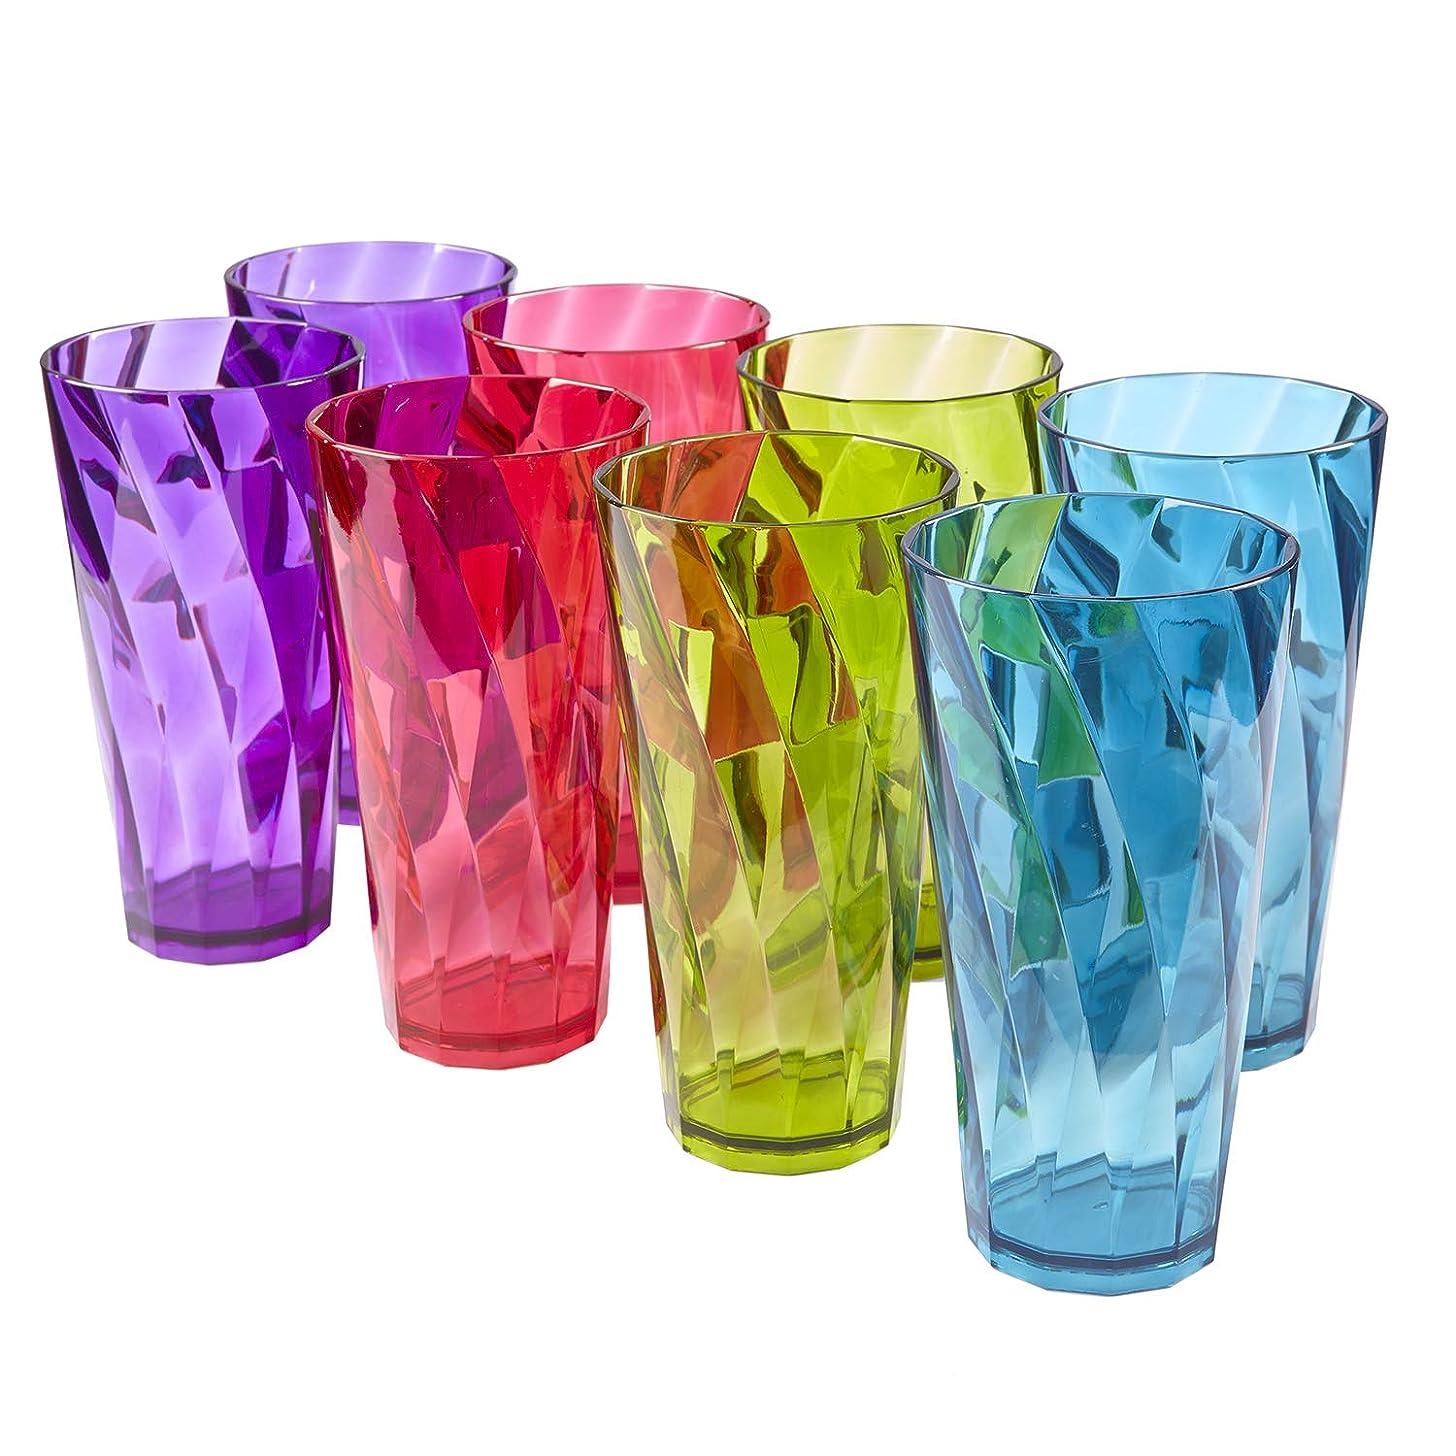 Optix 26-ounce Plastic Tumblers   set of 8 in 4 assorted colors